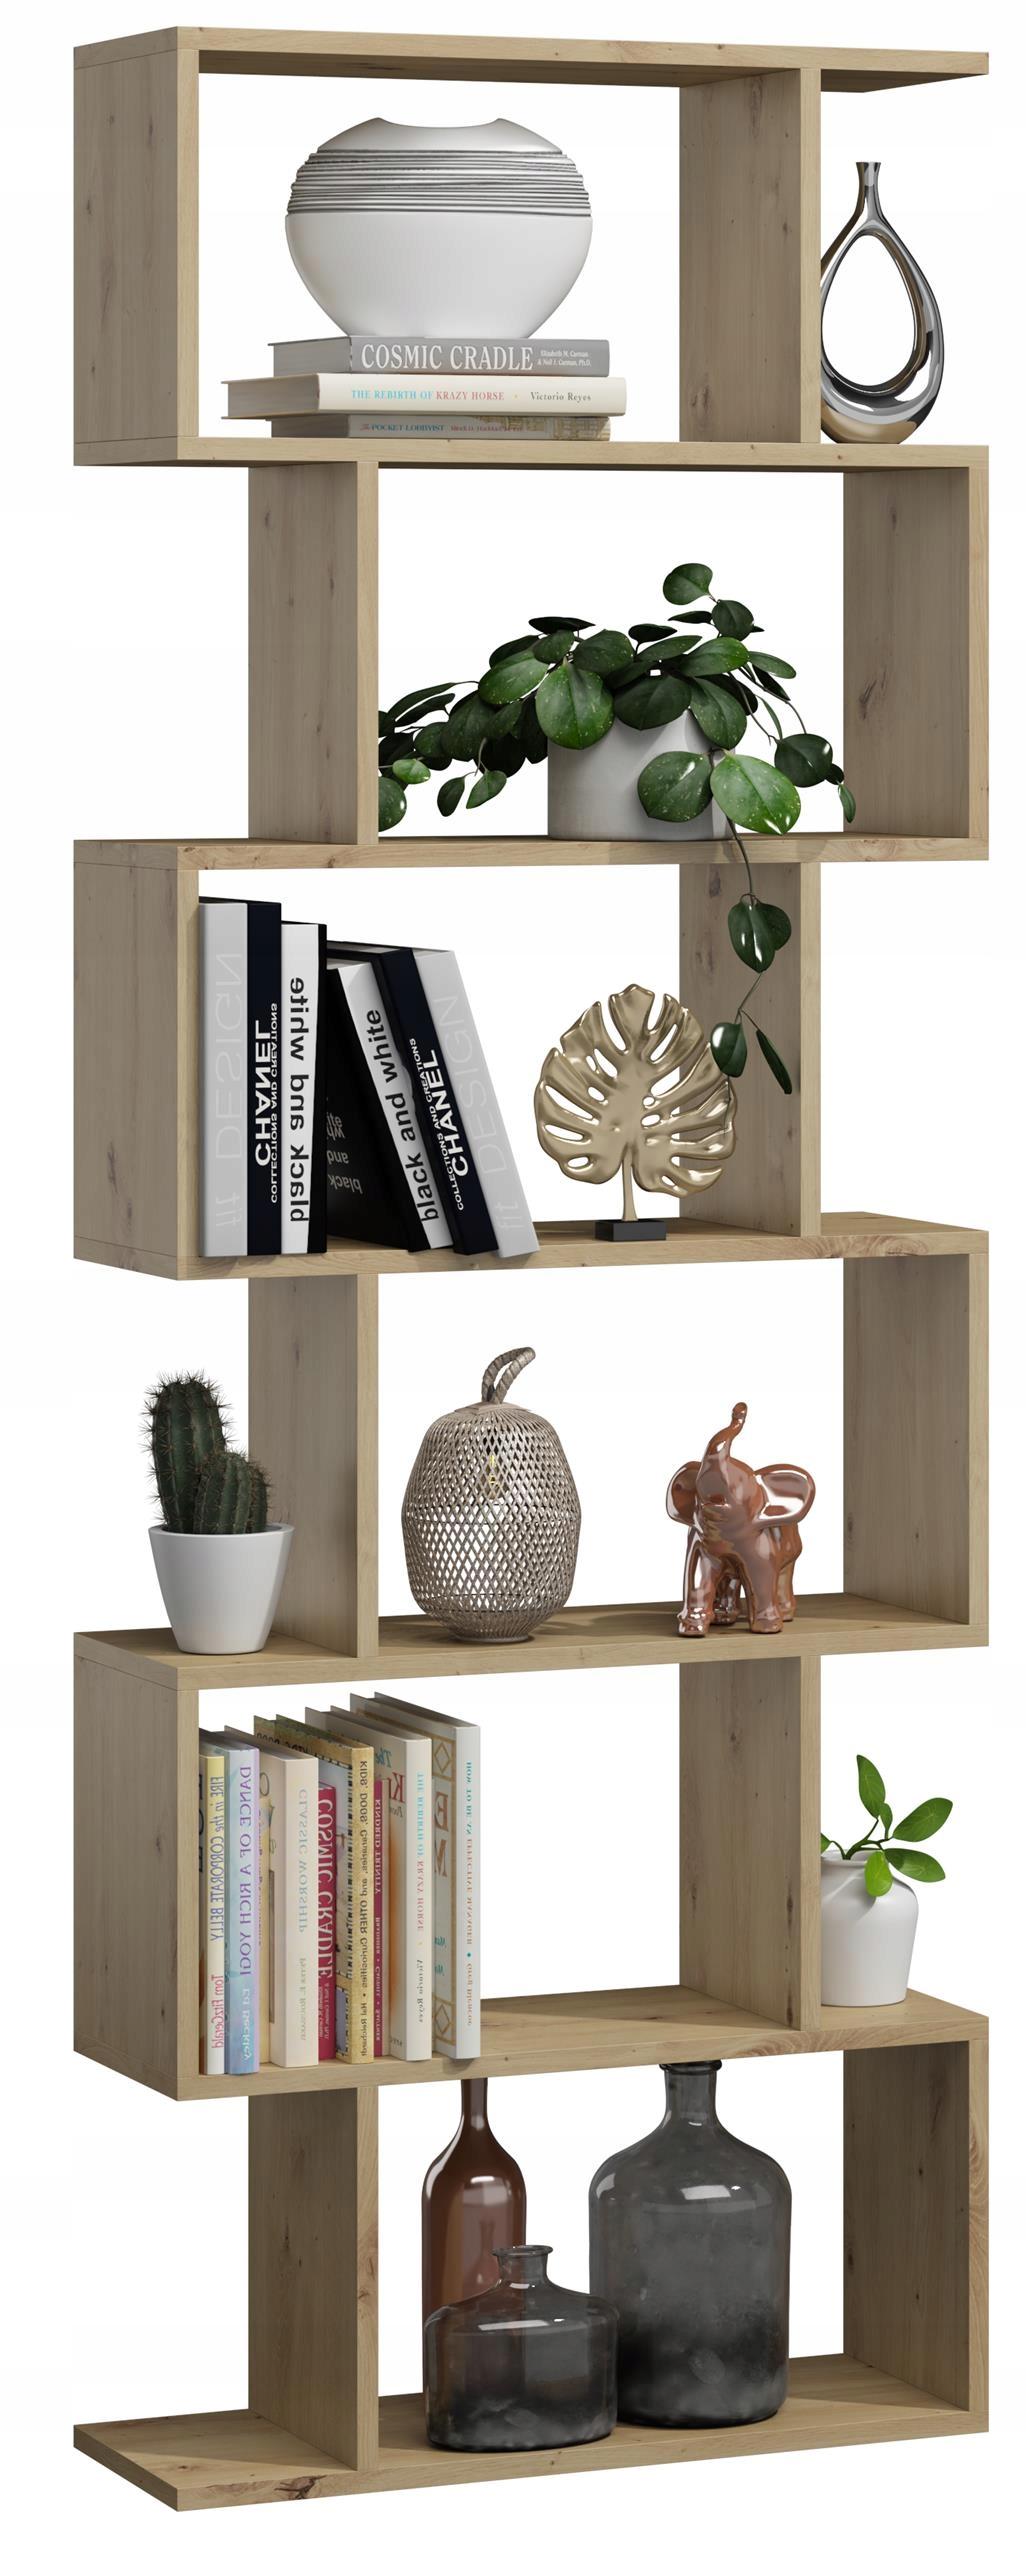 Книжный шкаф BASK MAX artisan oak открытая полка для шкафа